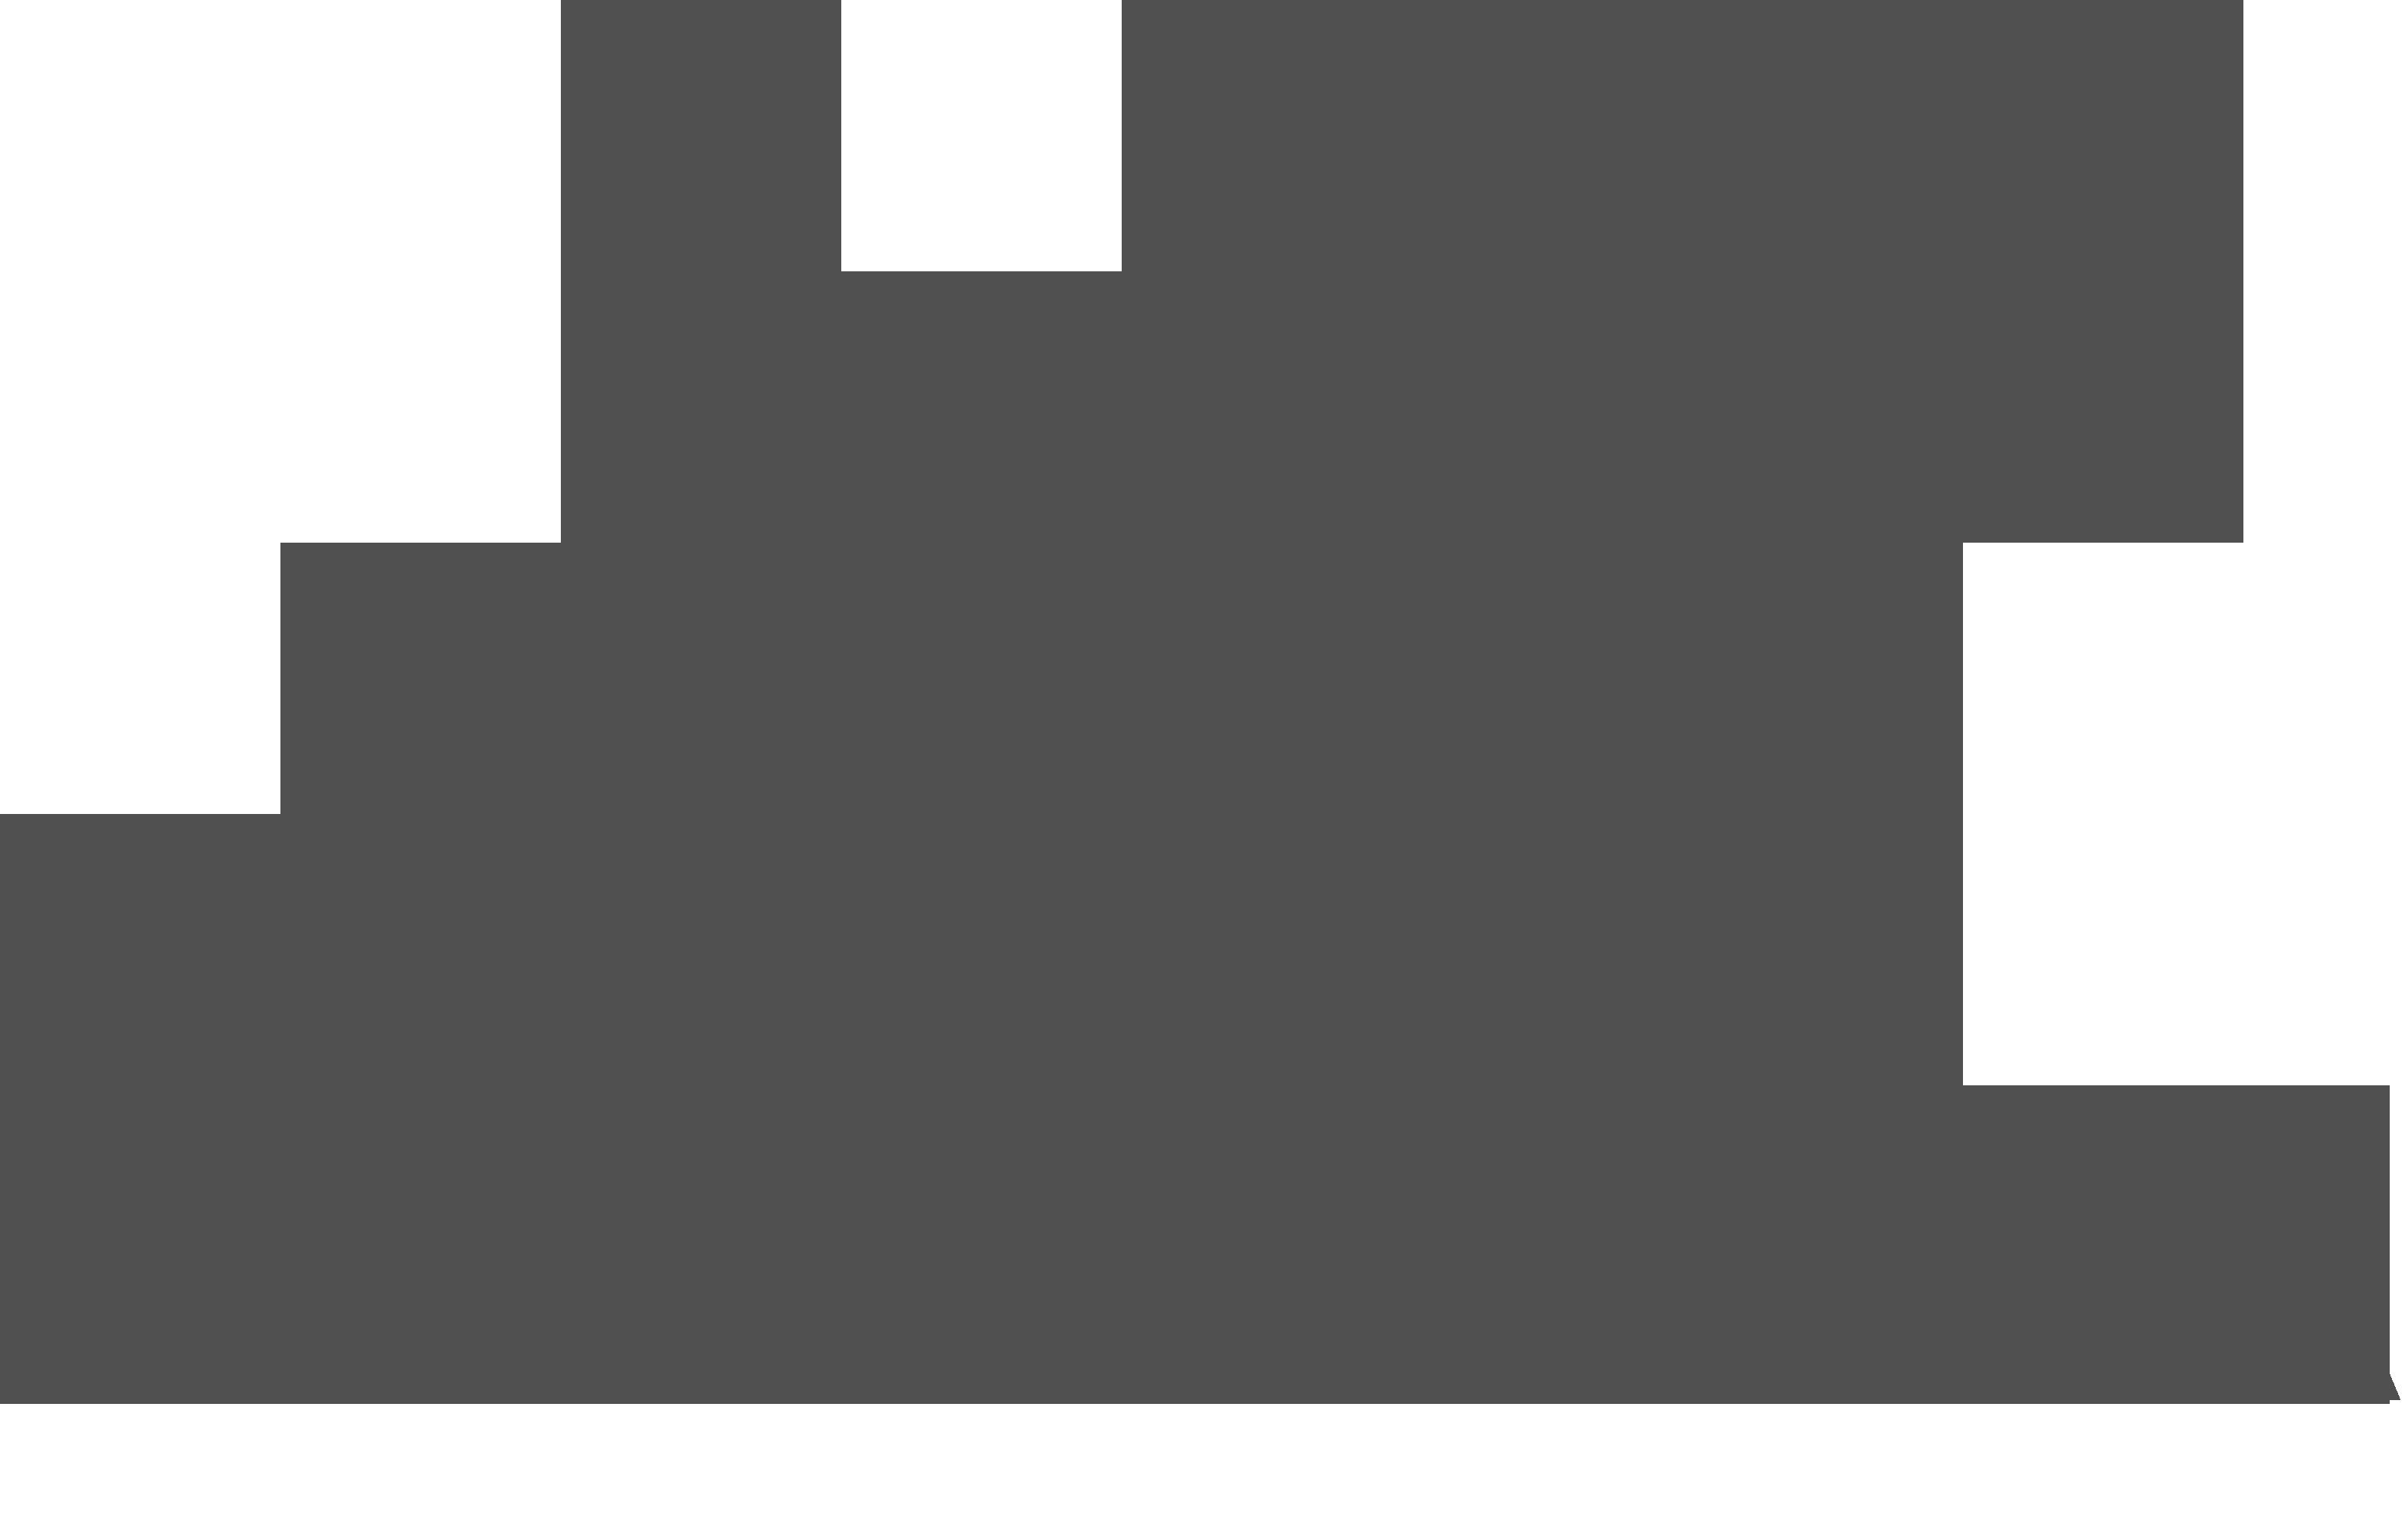 "Консультация гинеколога, эндокринолога и др. от 15 руб. в медцентре ""Грандмедика"""